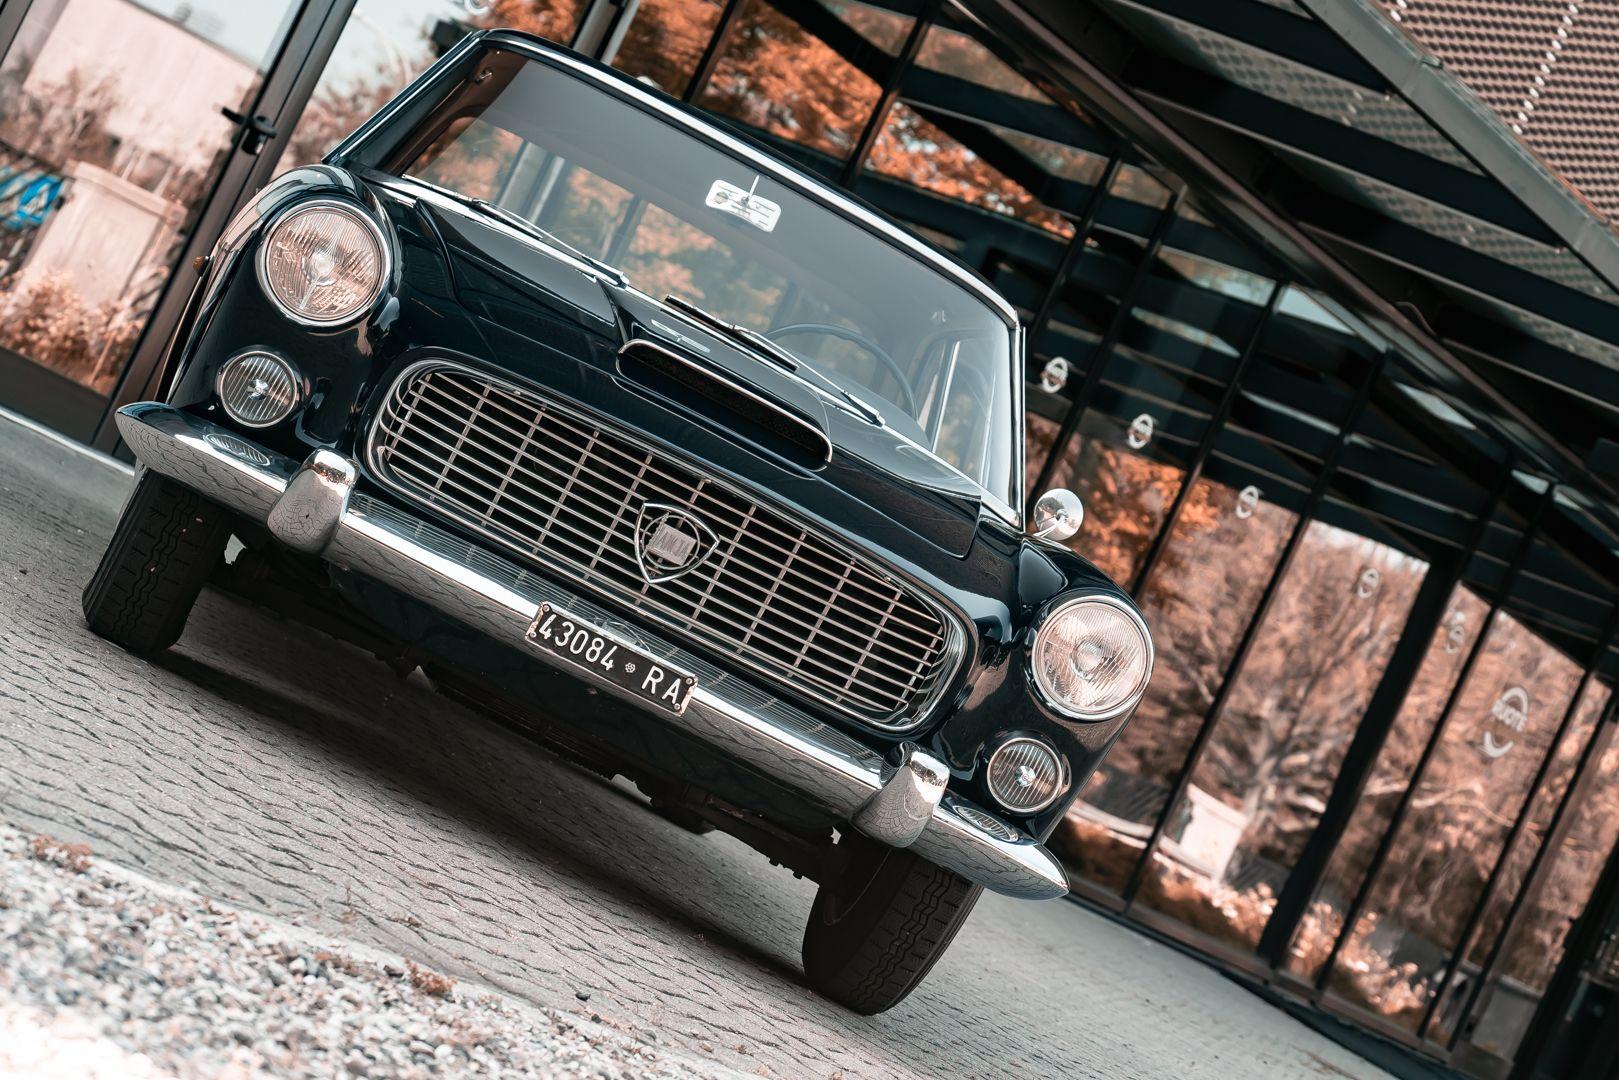 1960 Lancia Flaminia Coupé Pininfarina 2.5 76026